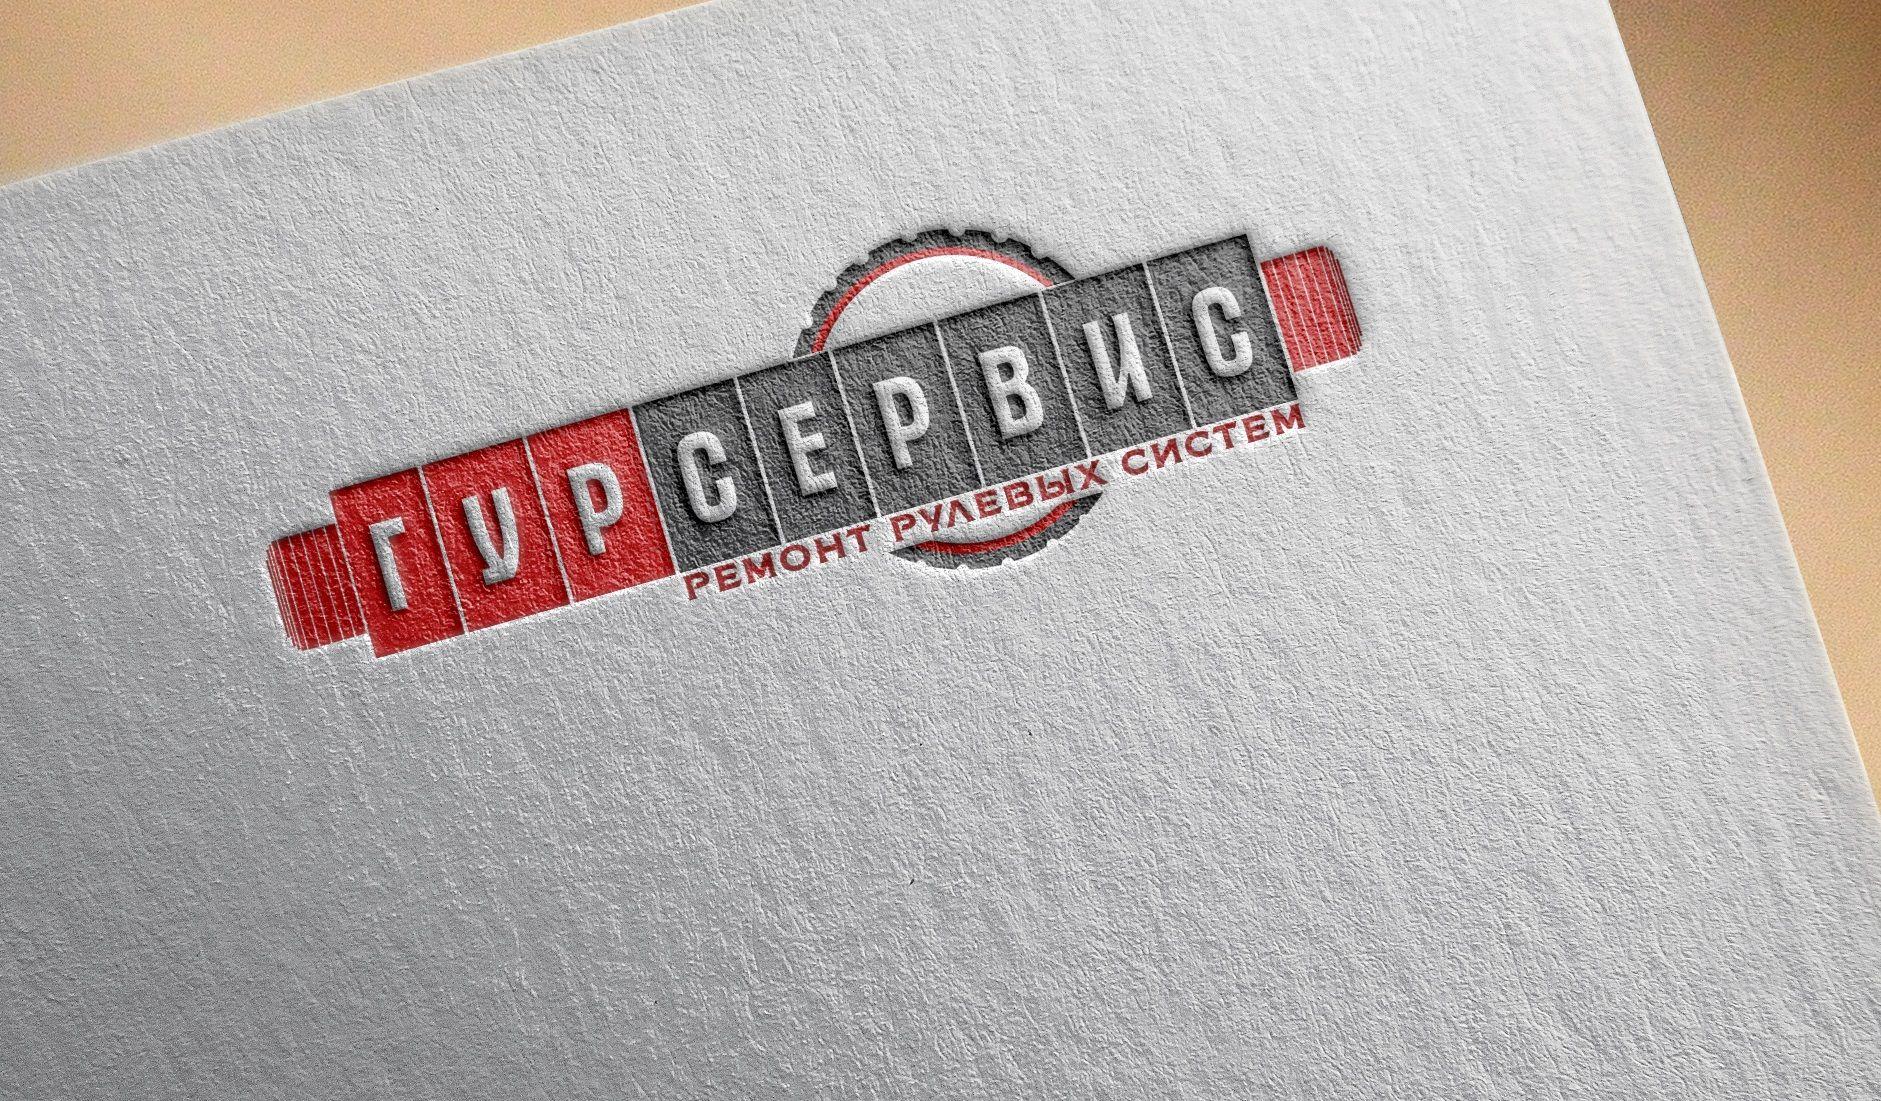 Логотип для ГУР-СЕРВИС - дизайнер asfar1123